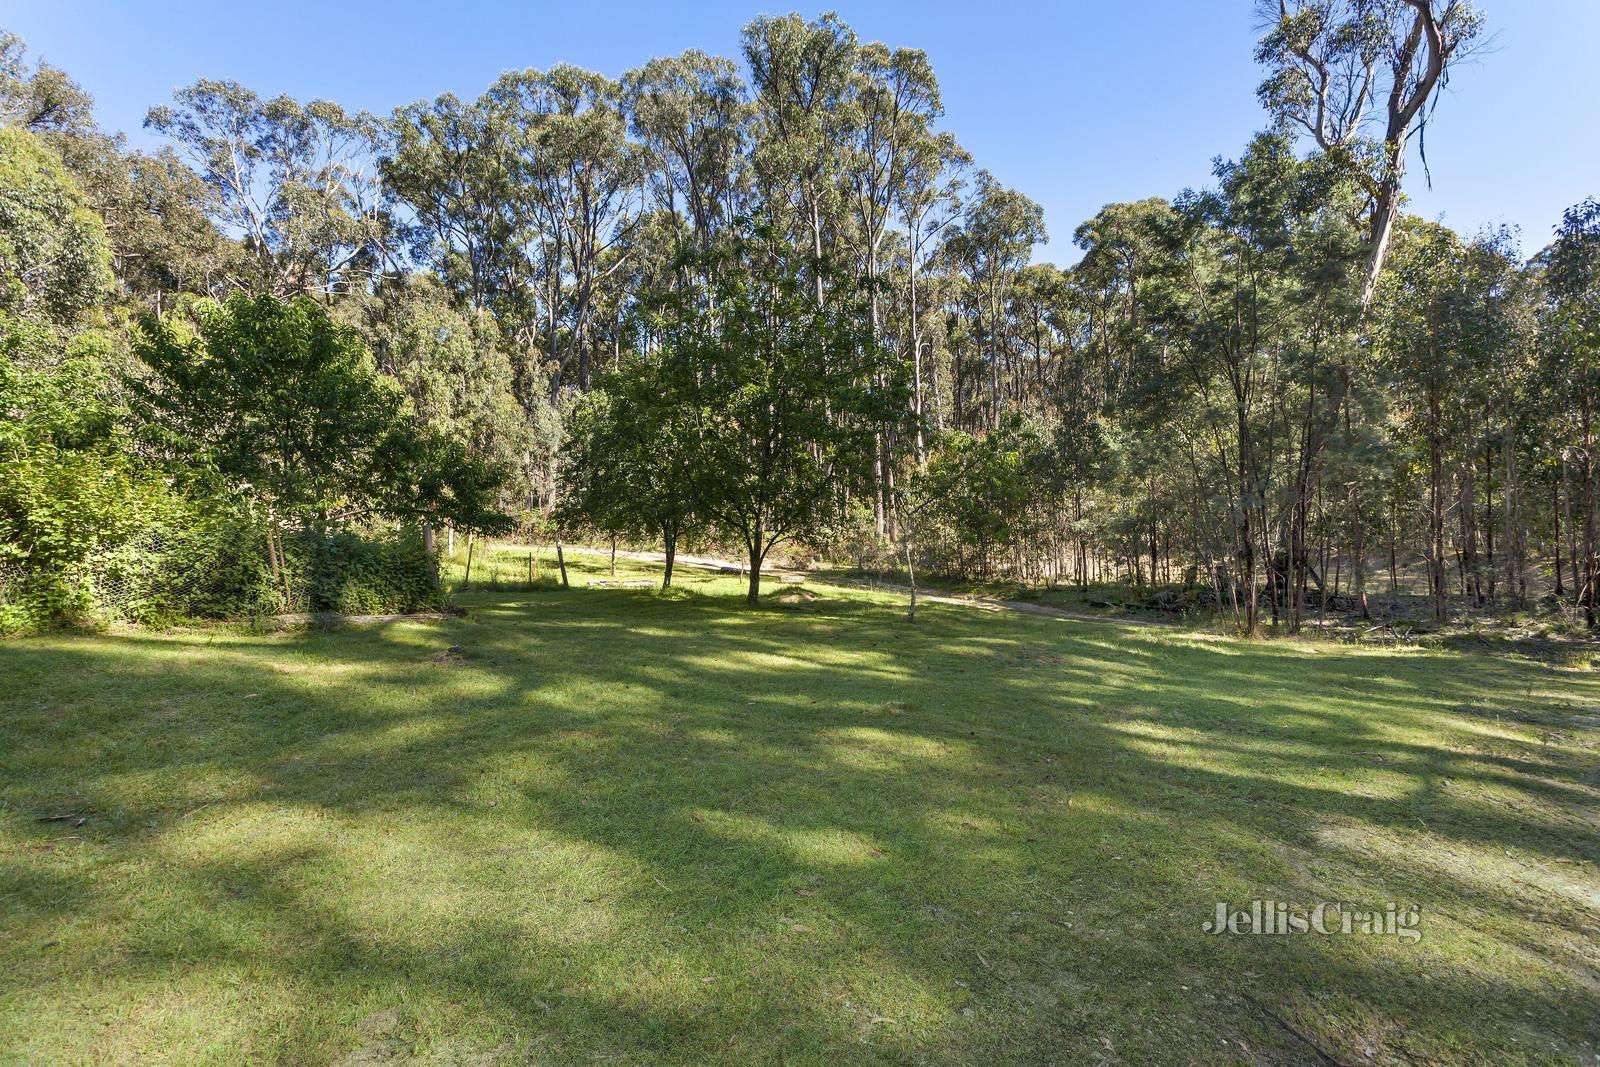 35 Kangaroo Drive, Coomoora VIC 3461, Image 1